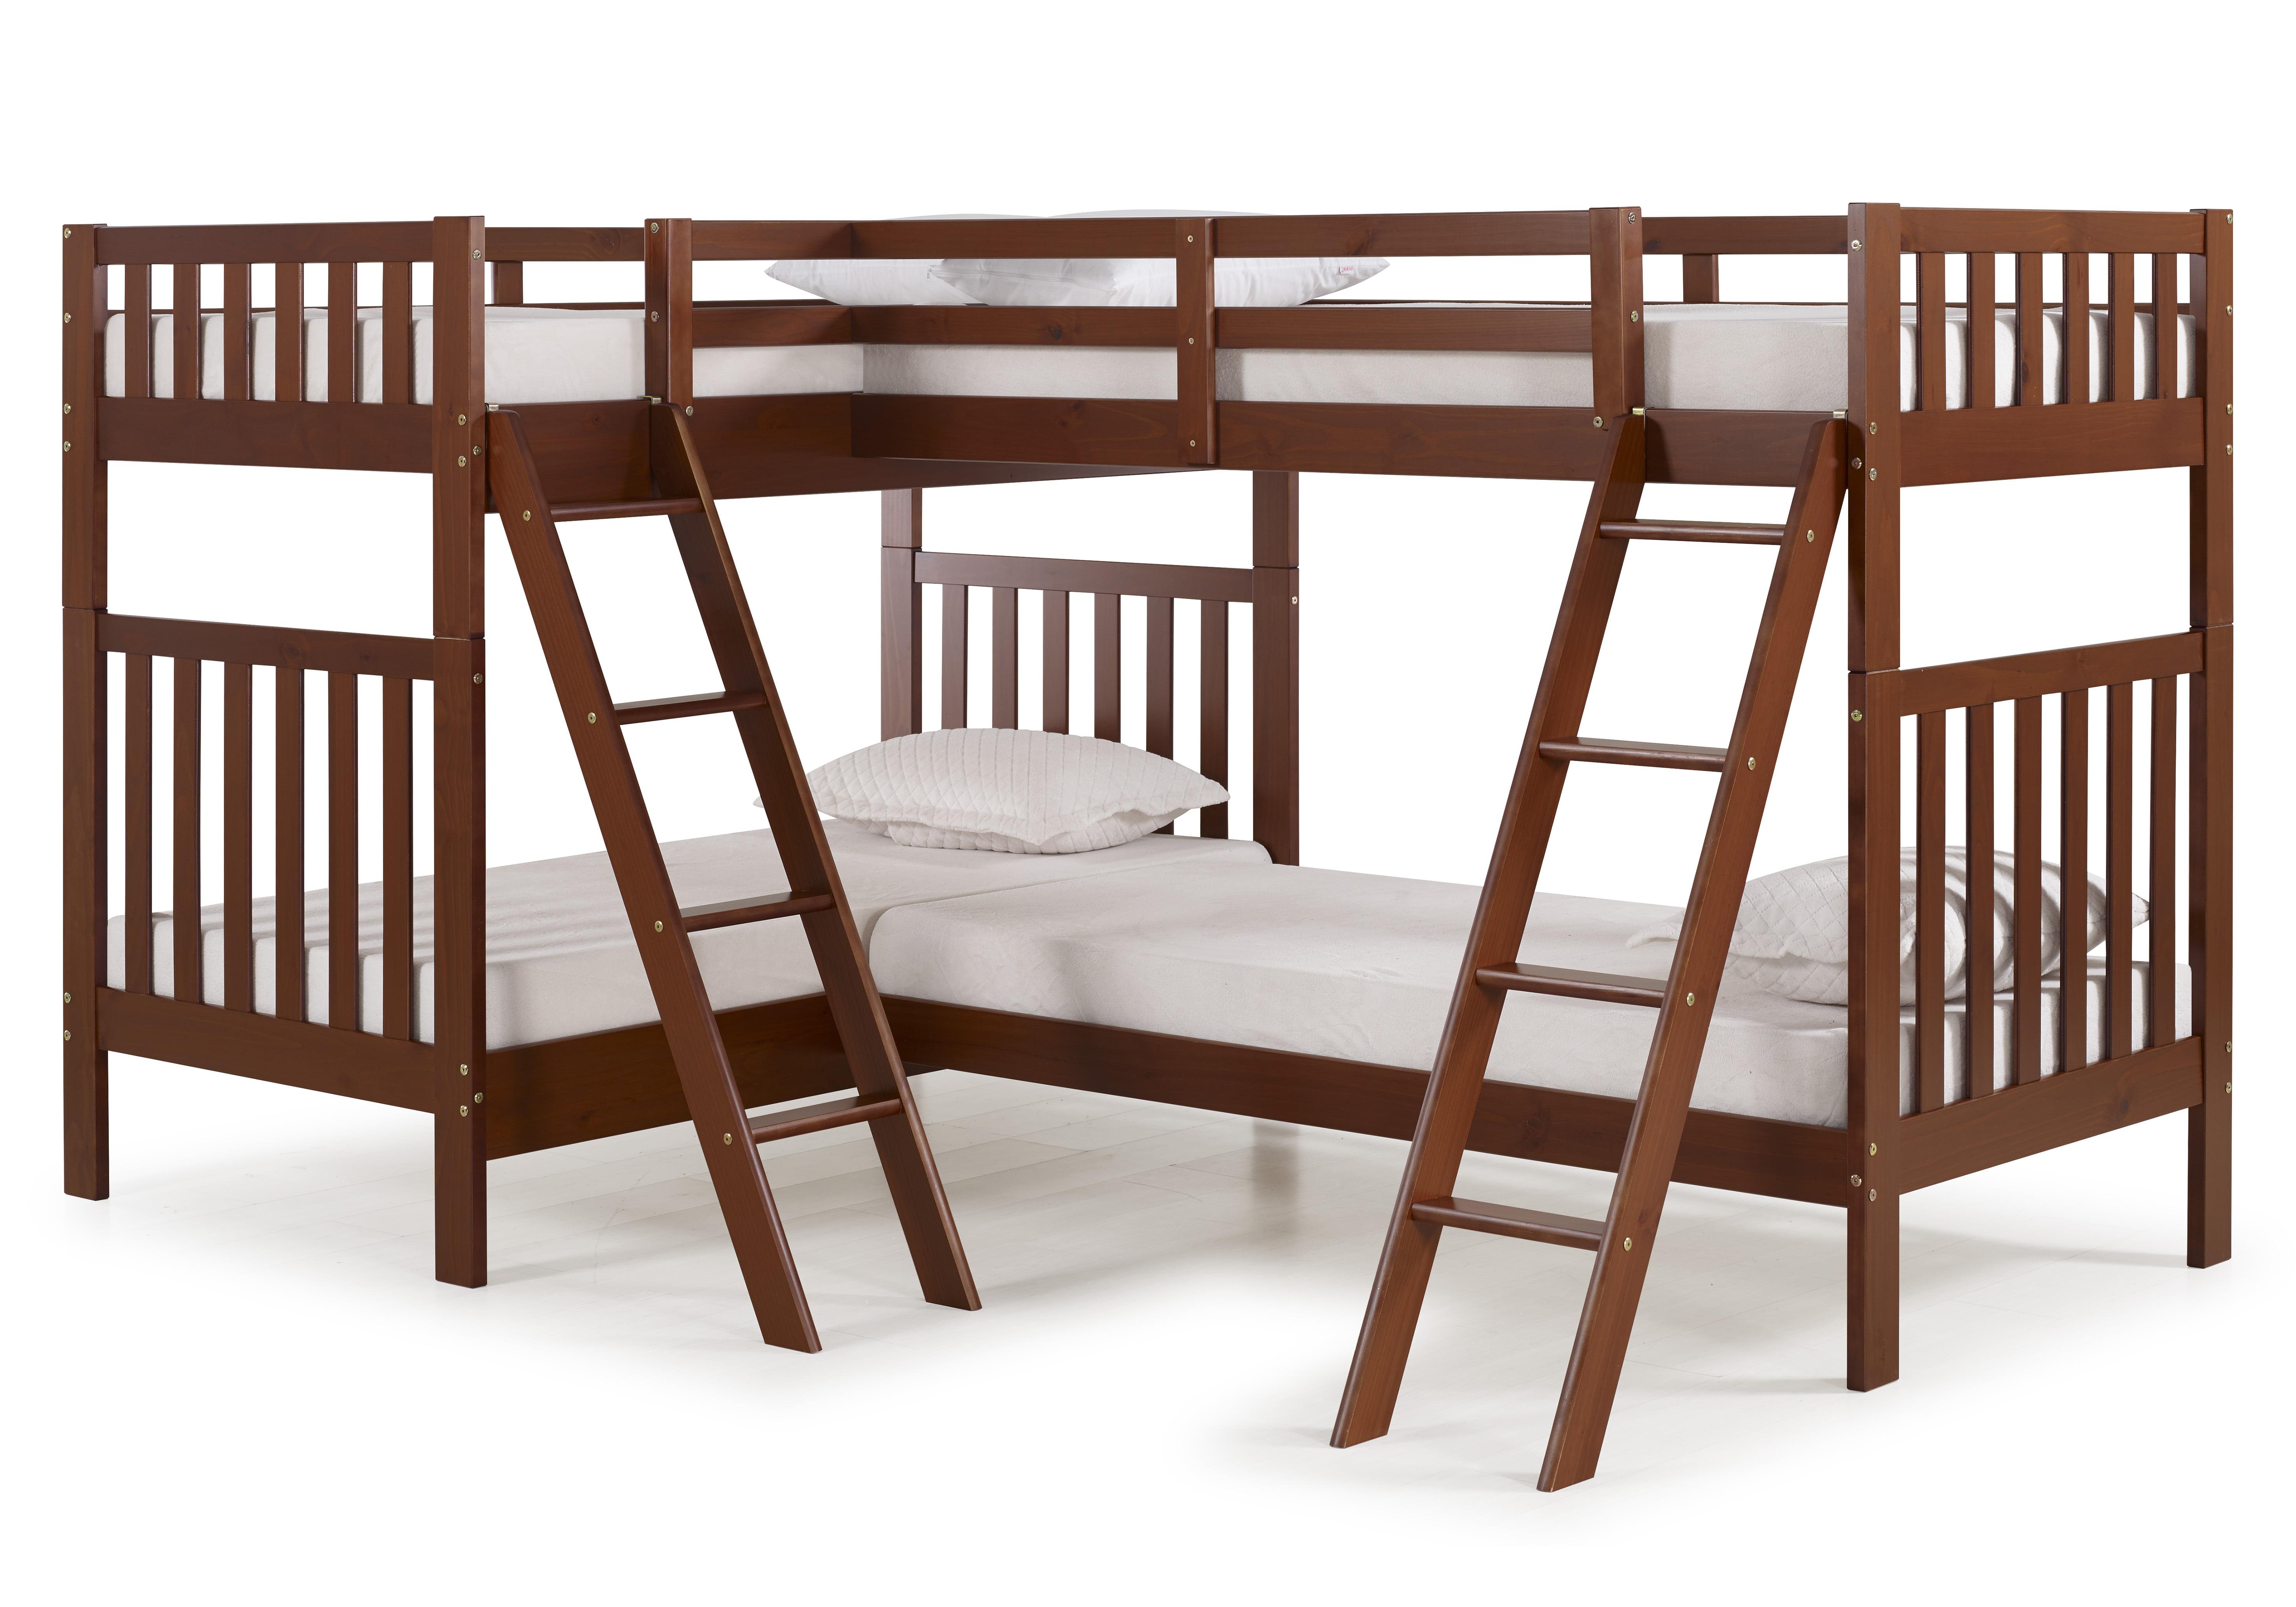 Aurora Twin Over Twin Bunk Bed With Quad Bunk Extension Chestnut Walmart Com Walmart Com